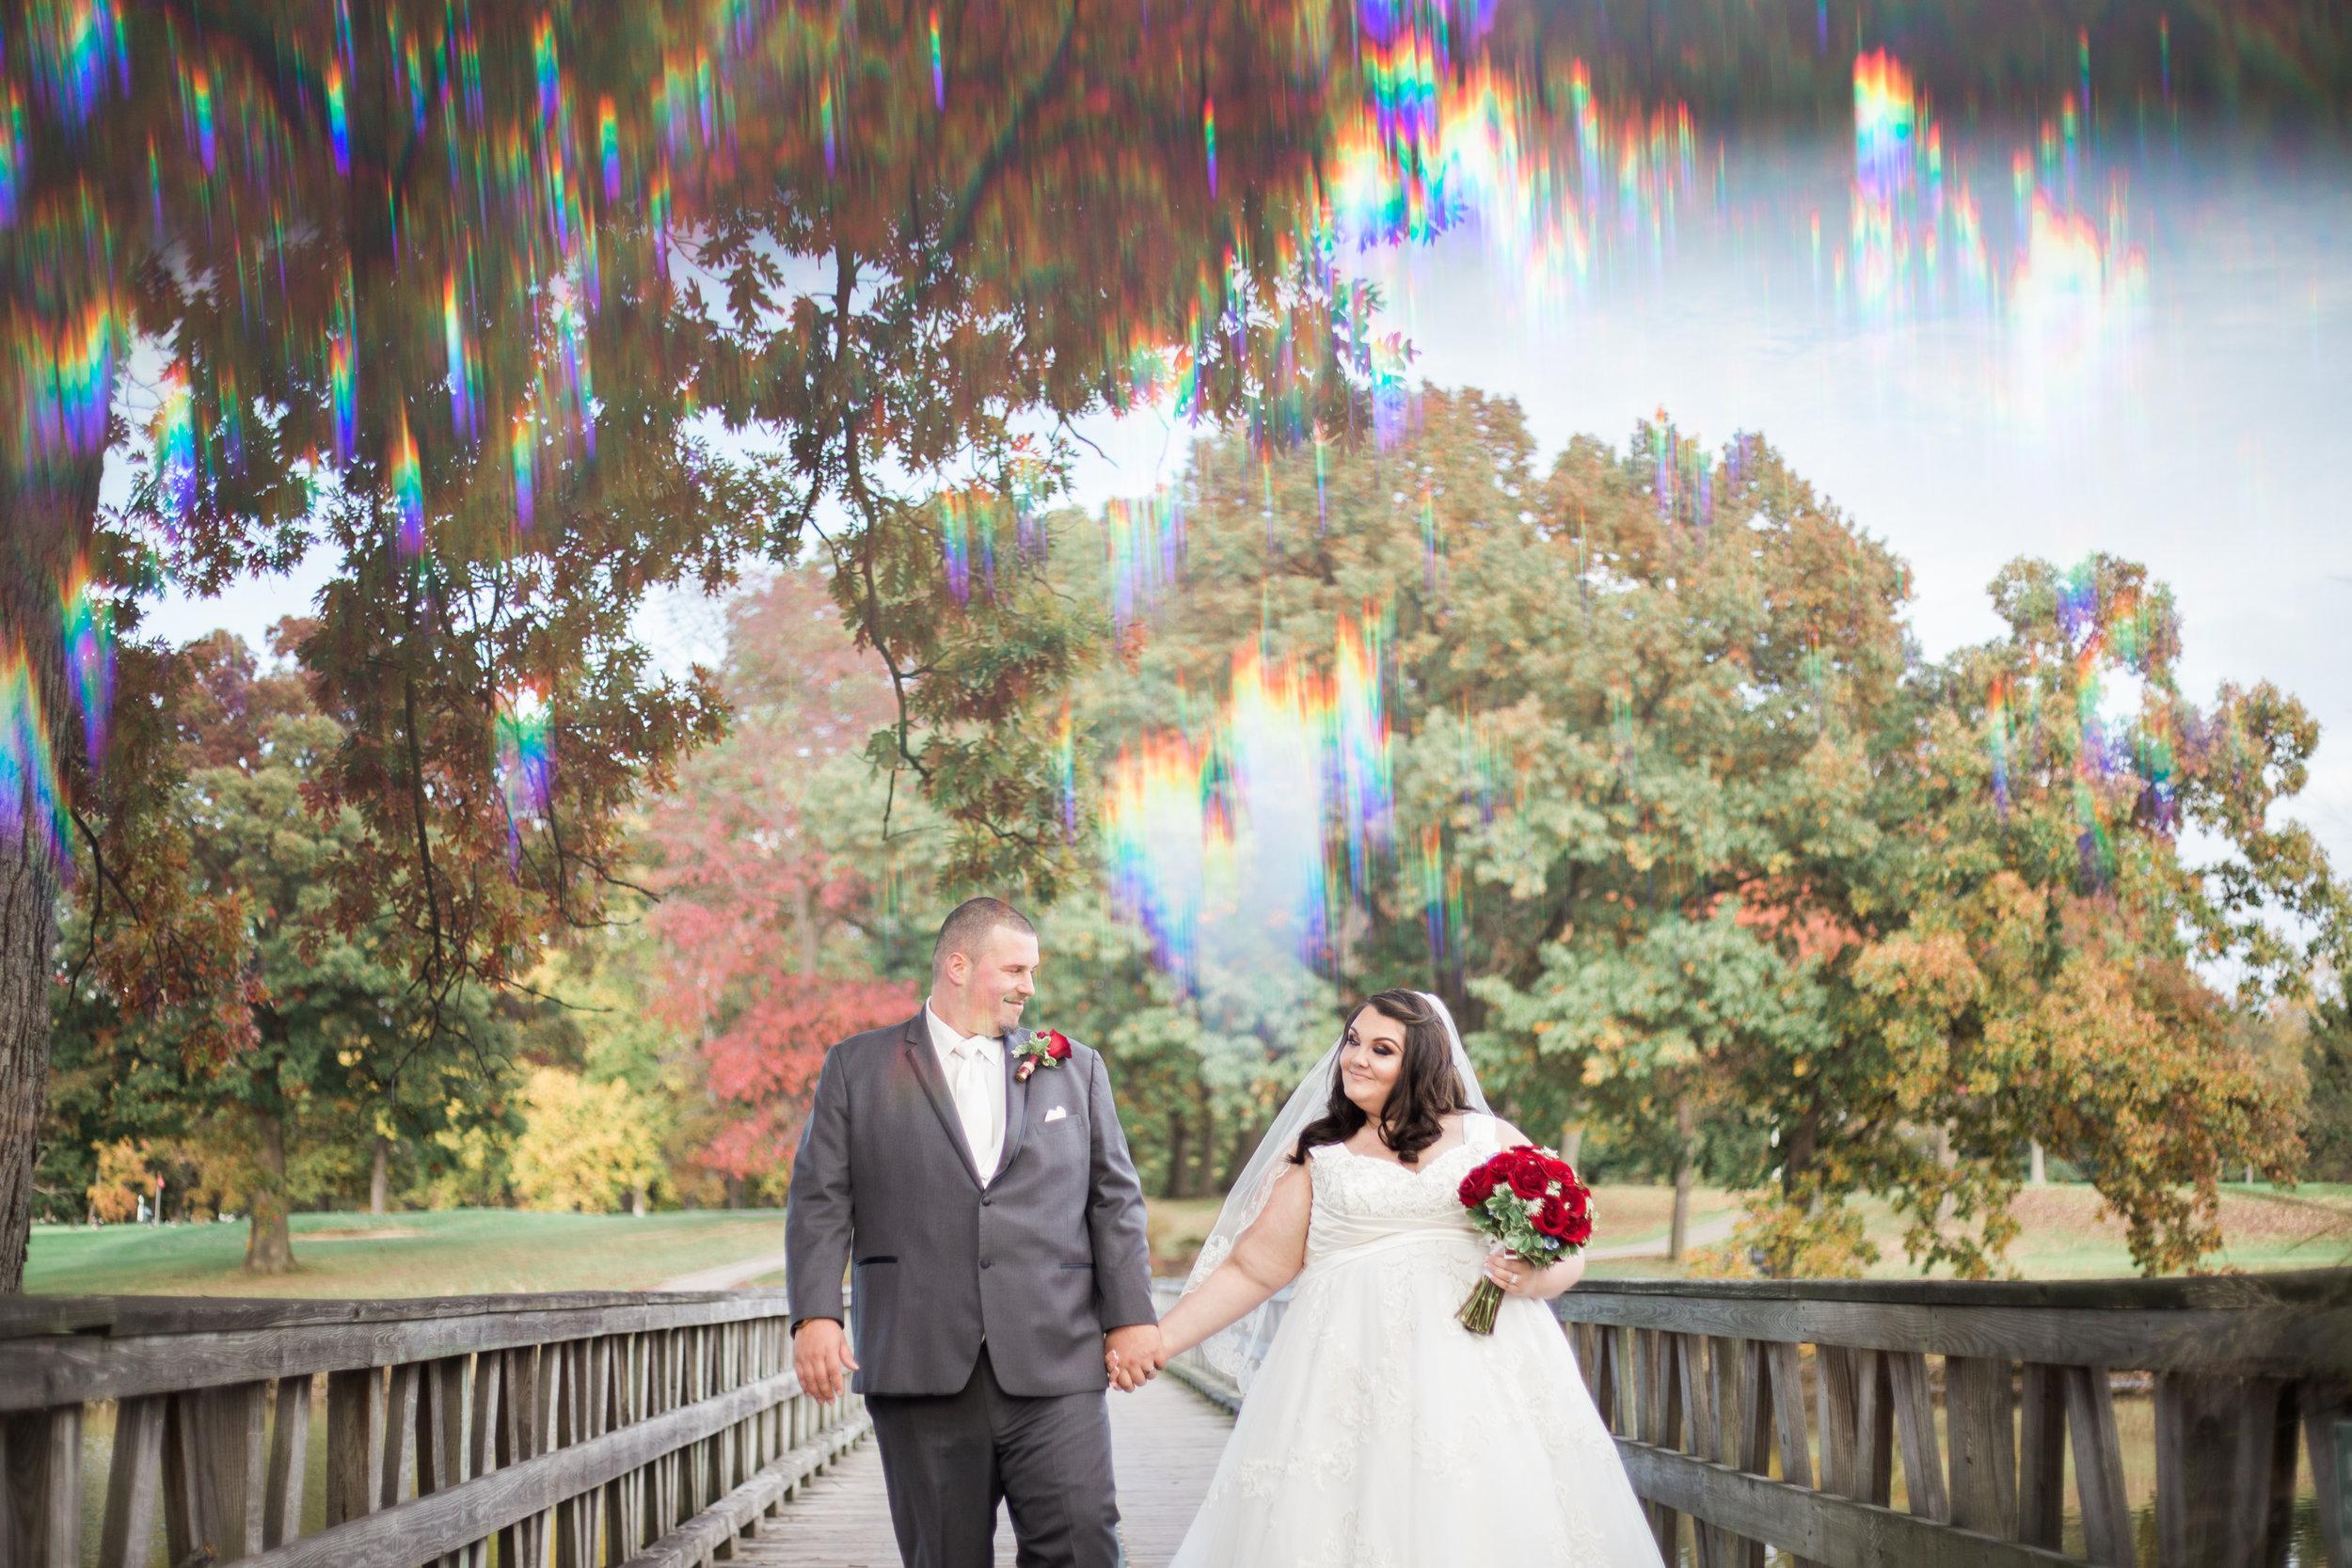 Best Husband and Wife Wedding Photographers in Glen Burnie Maryland.jpeg